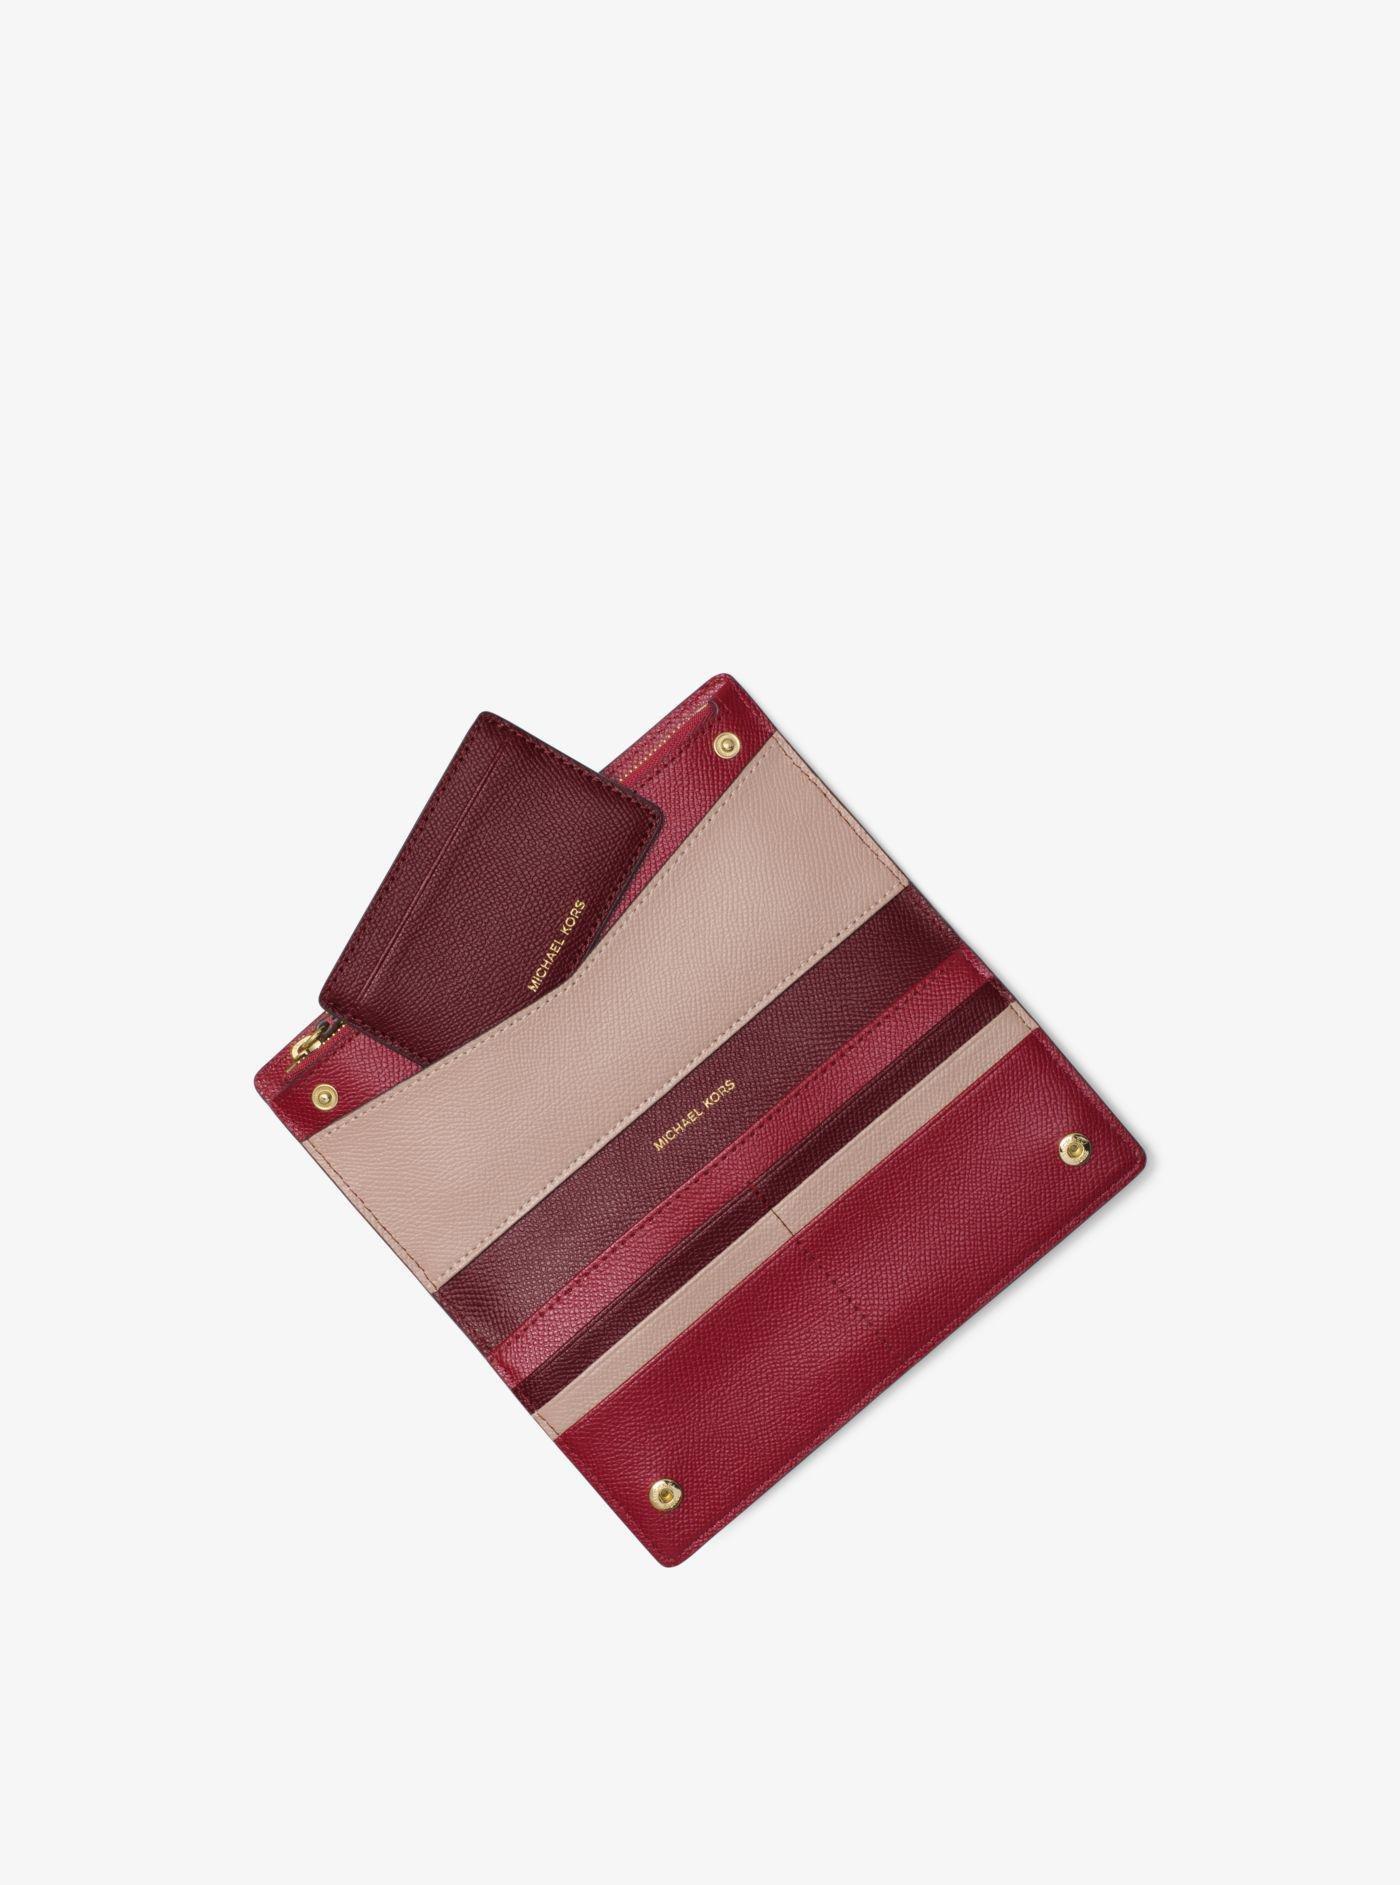 f6097d6f0042 Michael Kors Large Saffiano Leather Slim Wallet - Lyst